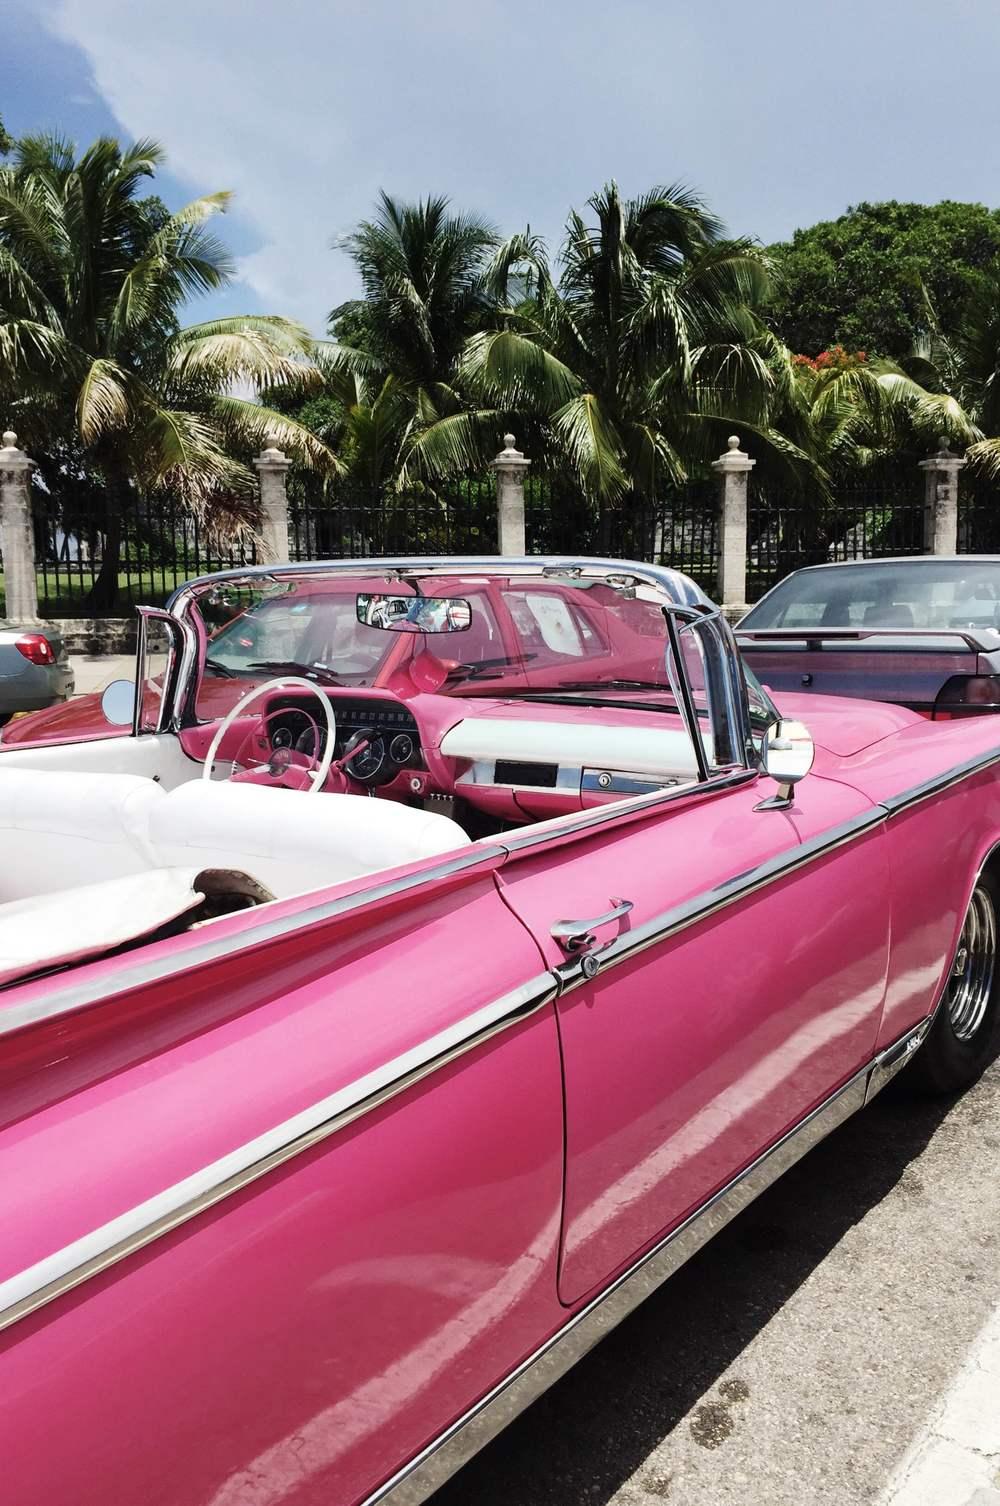 miss cloudy cuba travel guide la havana old car pink